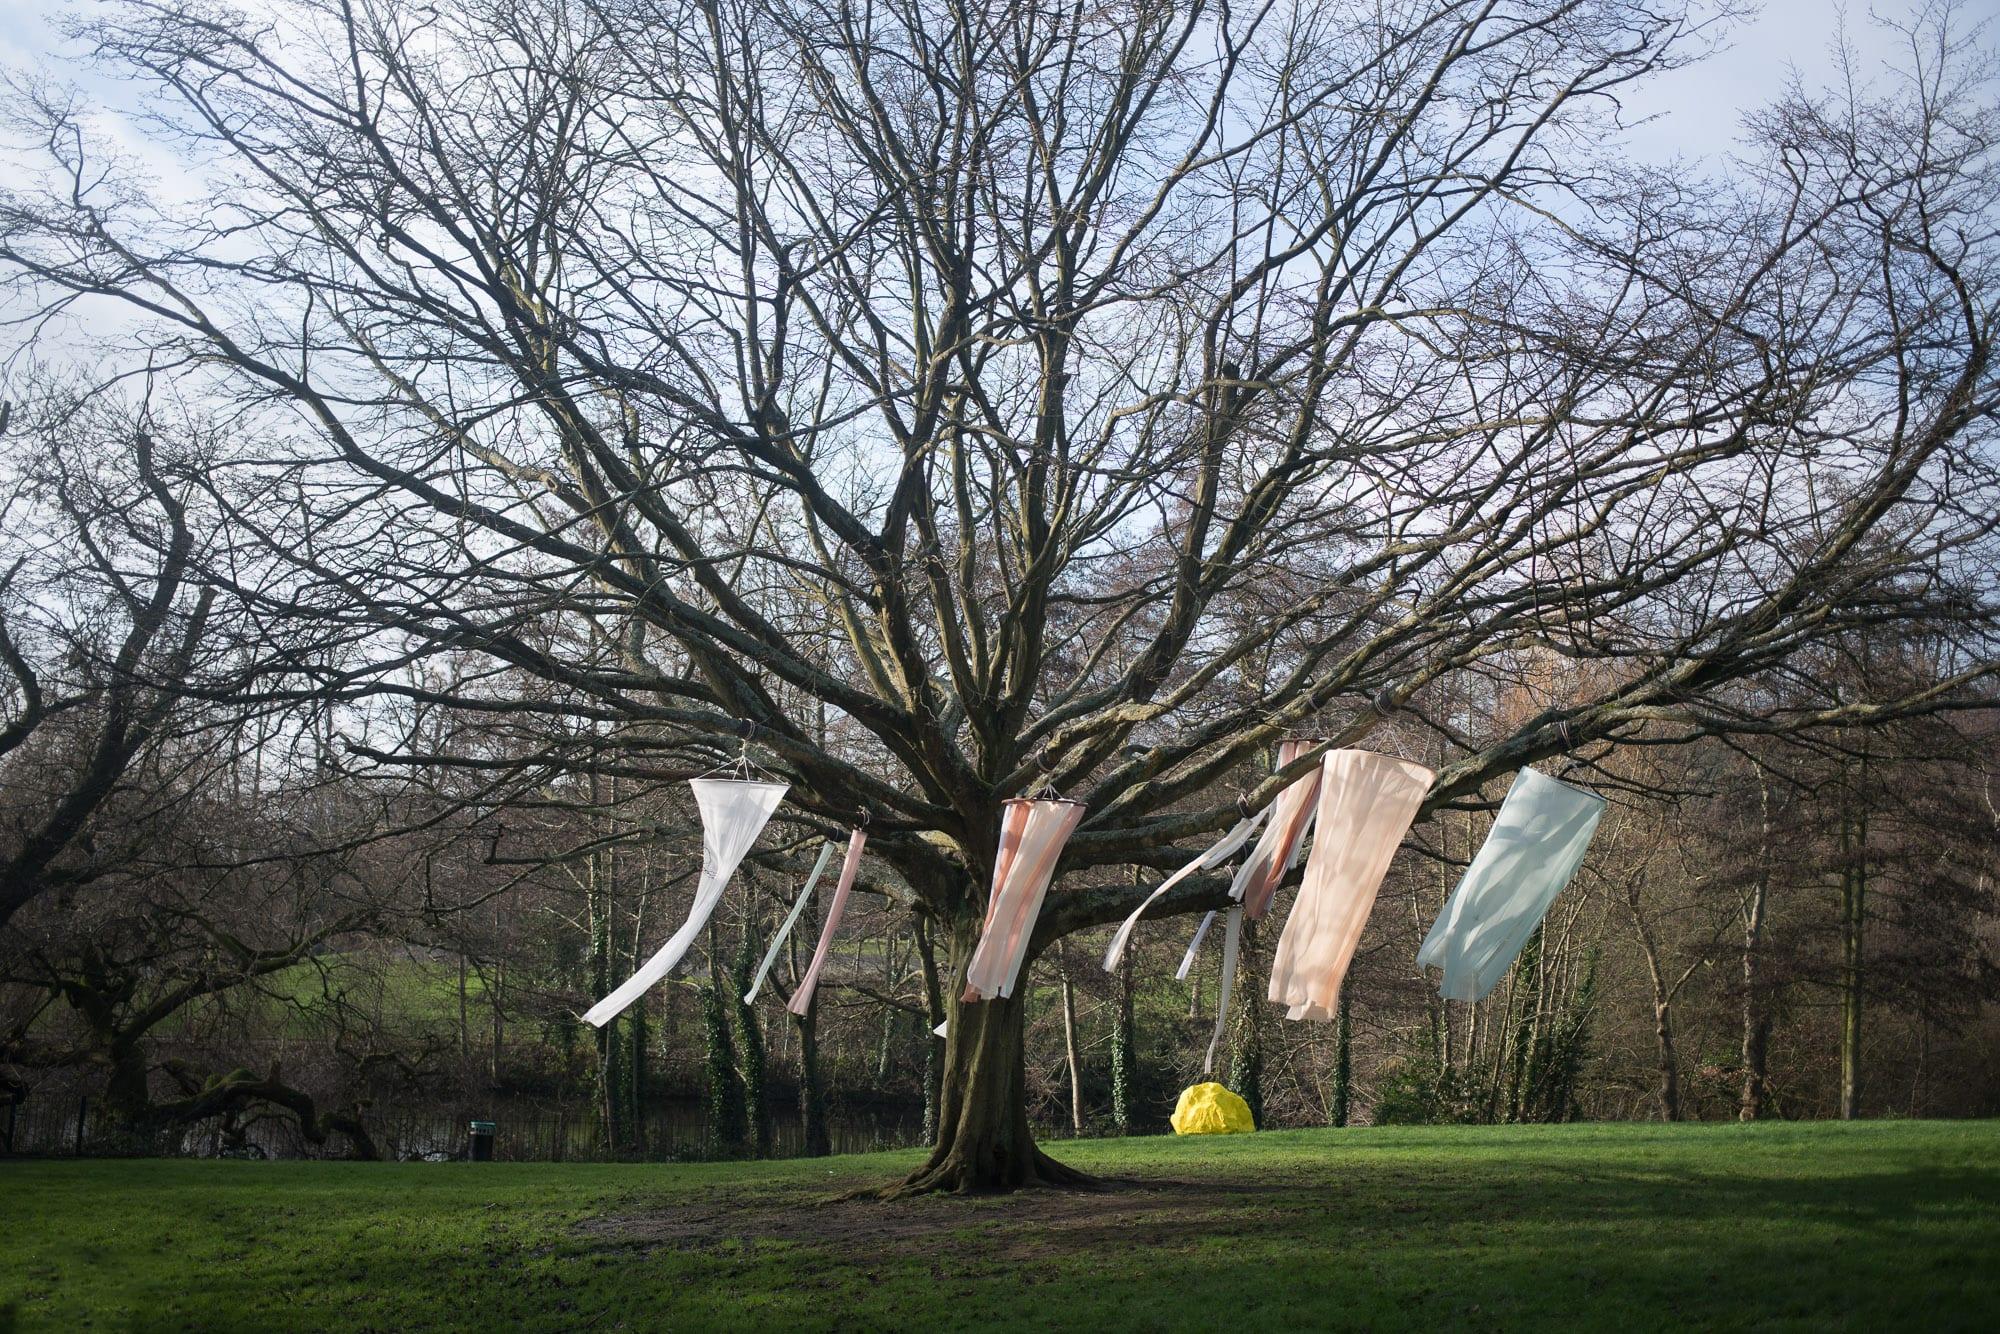 Foundation-Fine-Art-Park-2018-Lara-Silva-photo-by-Tim-Meara.jpg